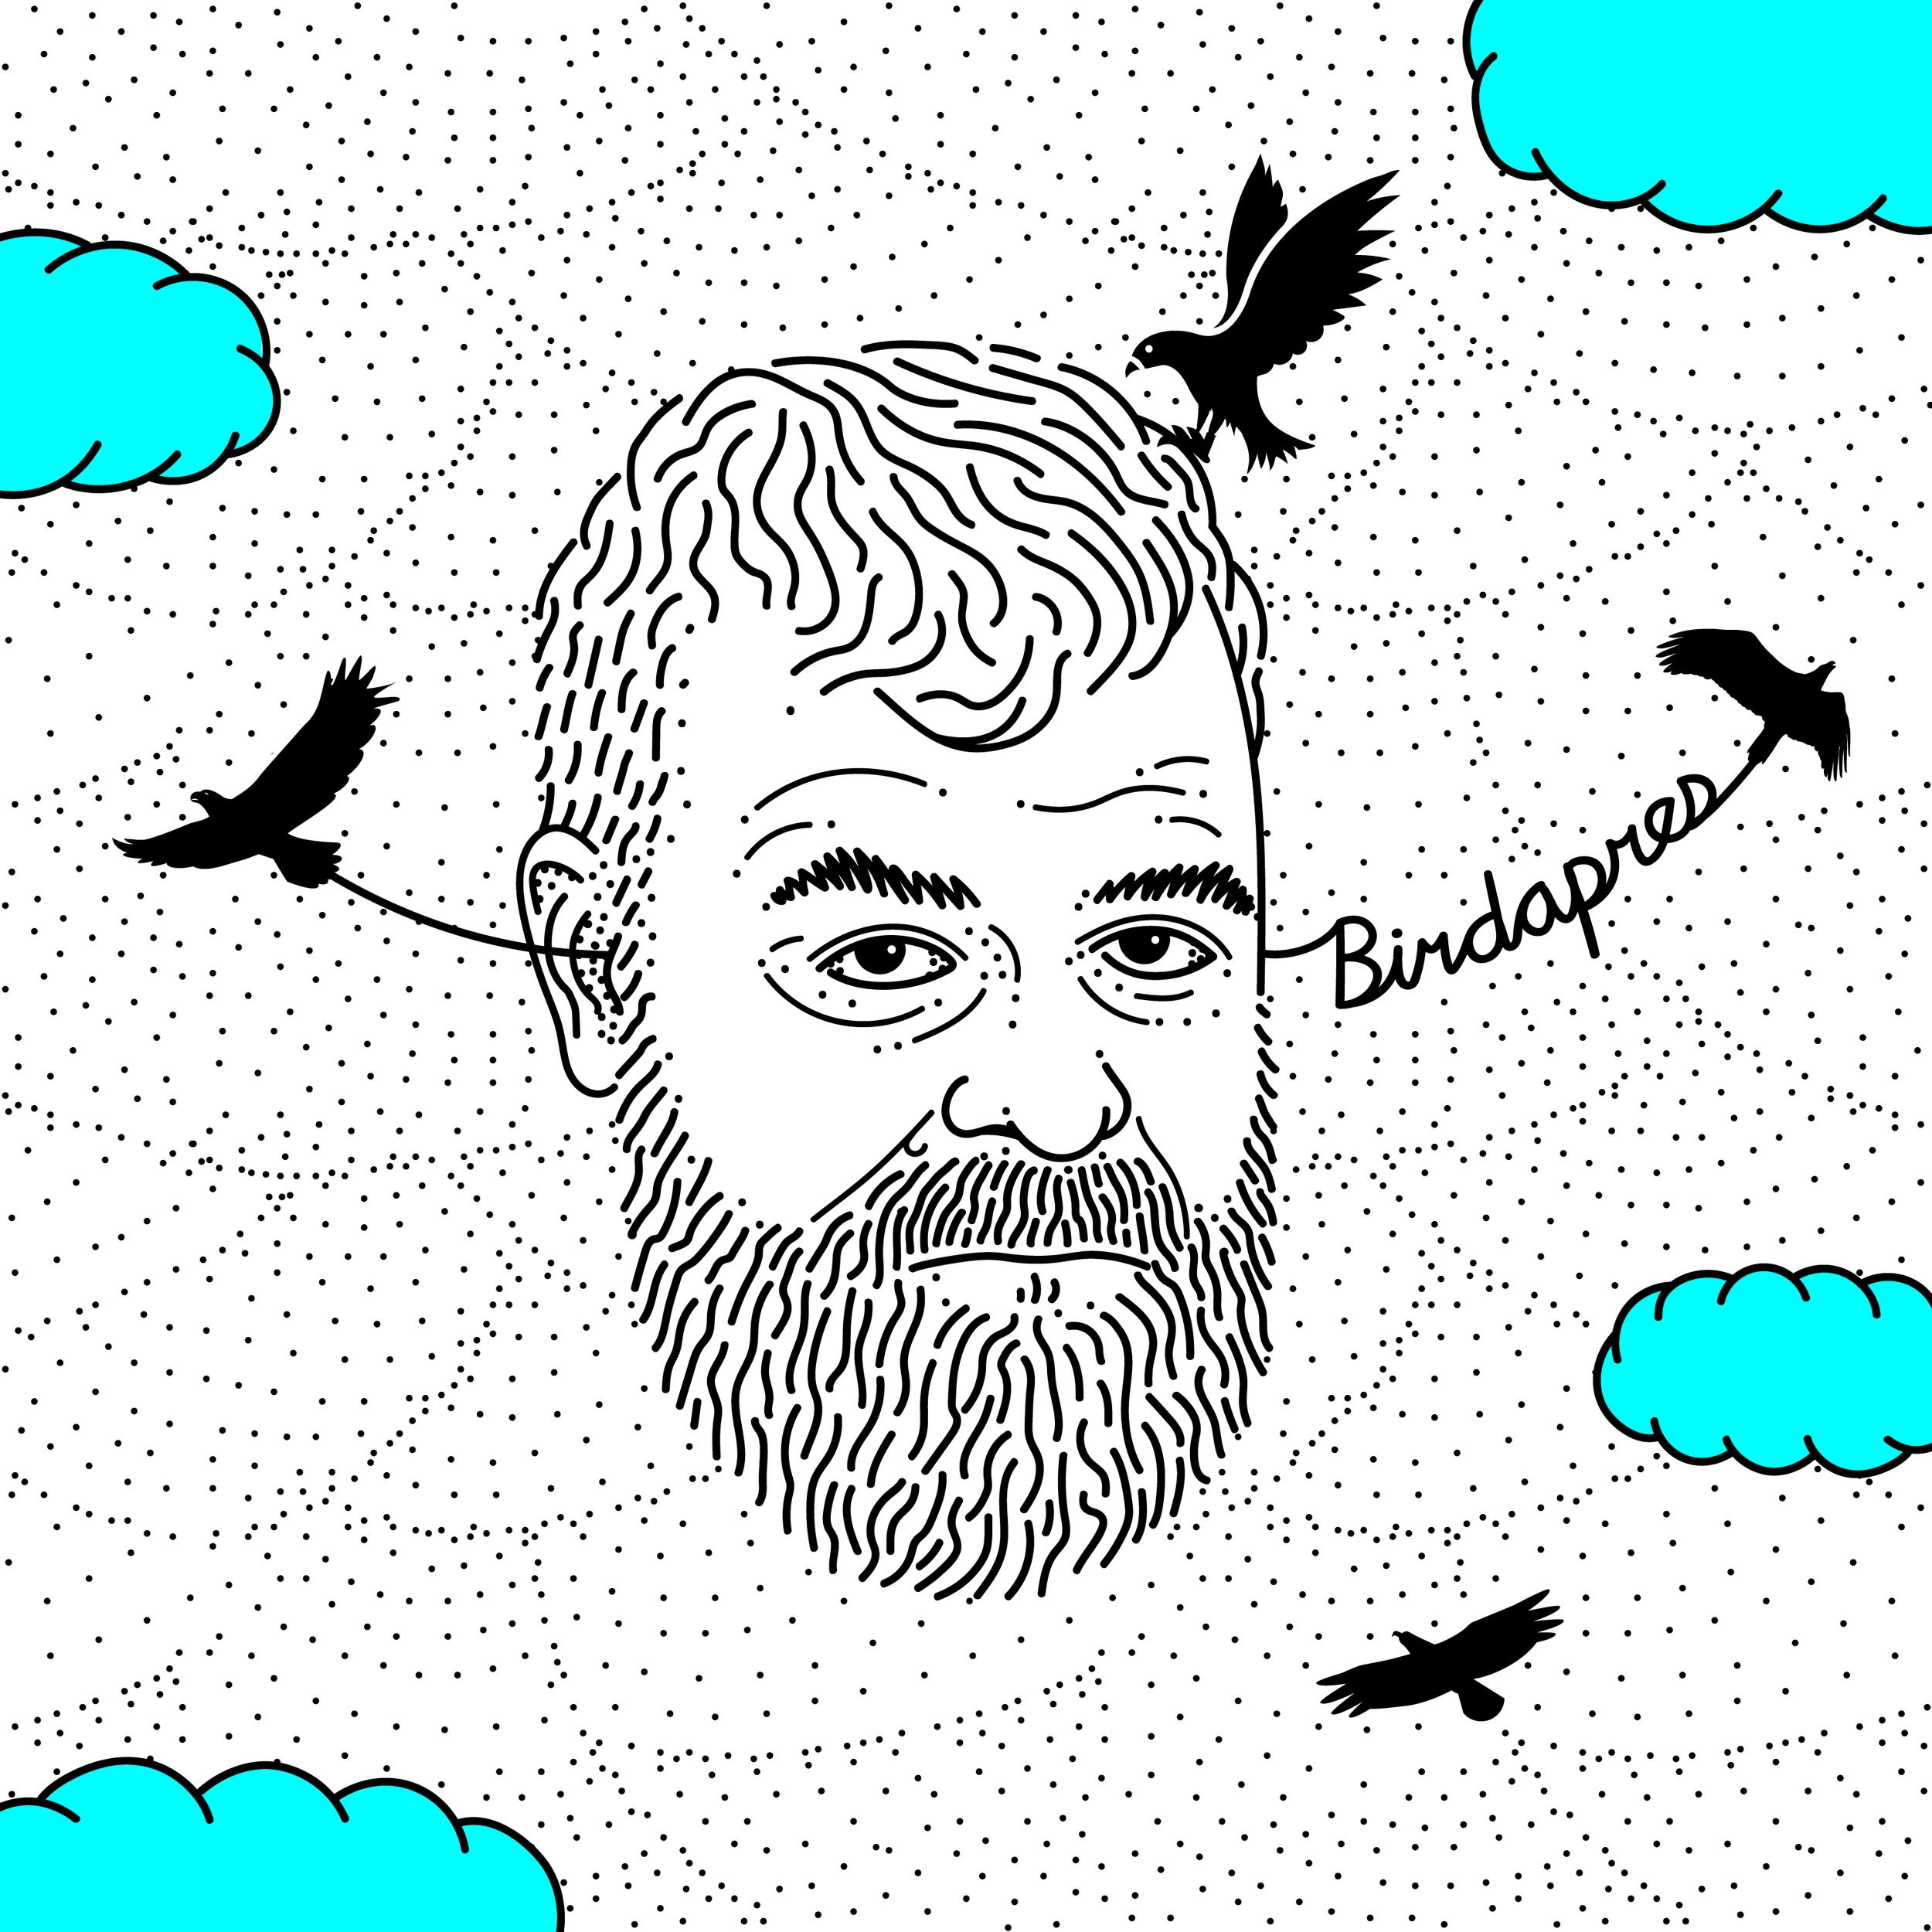 Episode 27 - Birdapres - Peanuts and Corn / Marathon of Dope